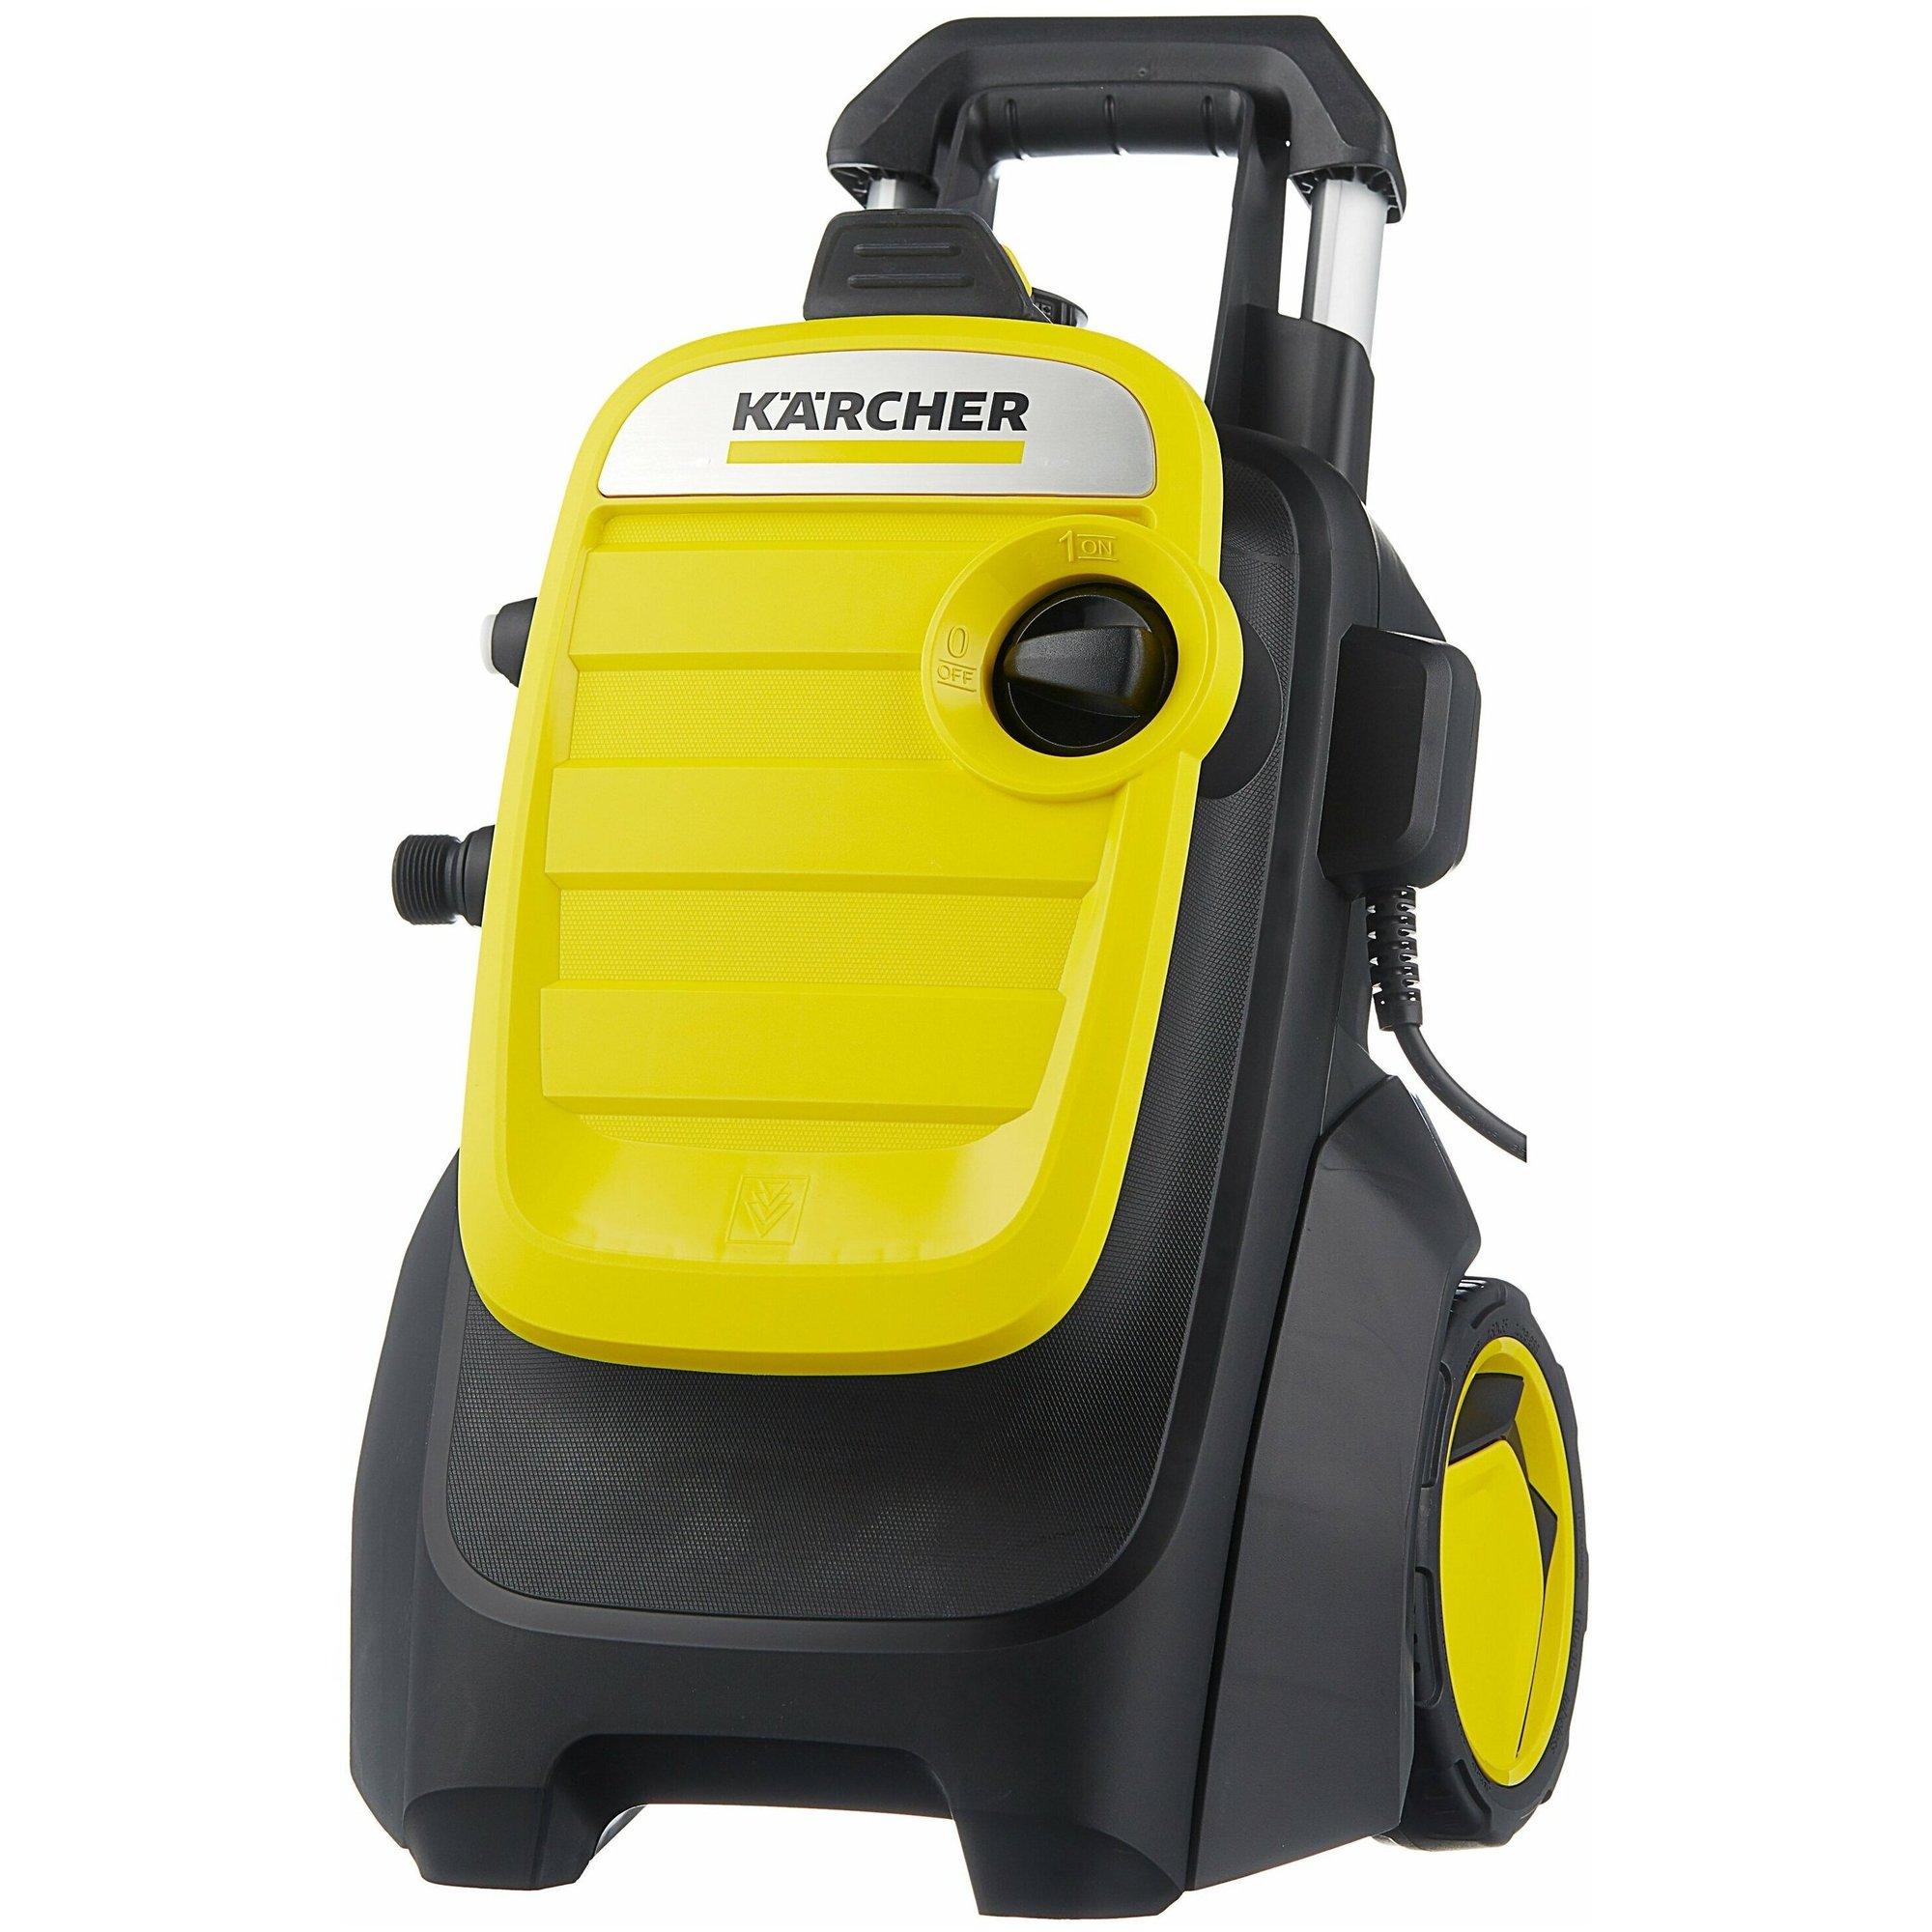 KARCHER K5 Compact Минимойка бытовая ВД Karcher арт 1.630-750